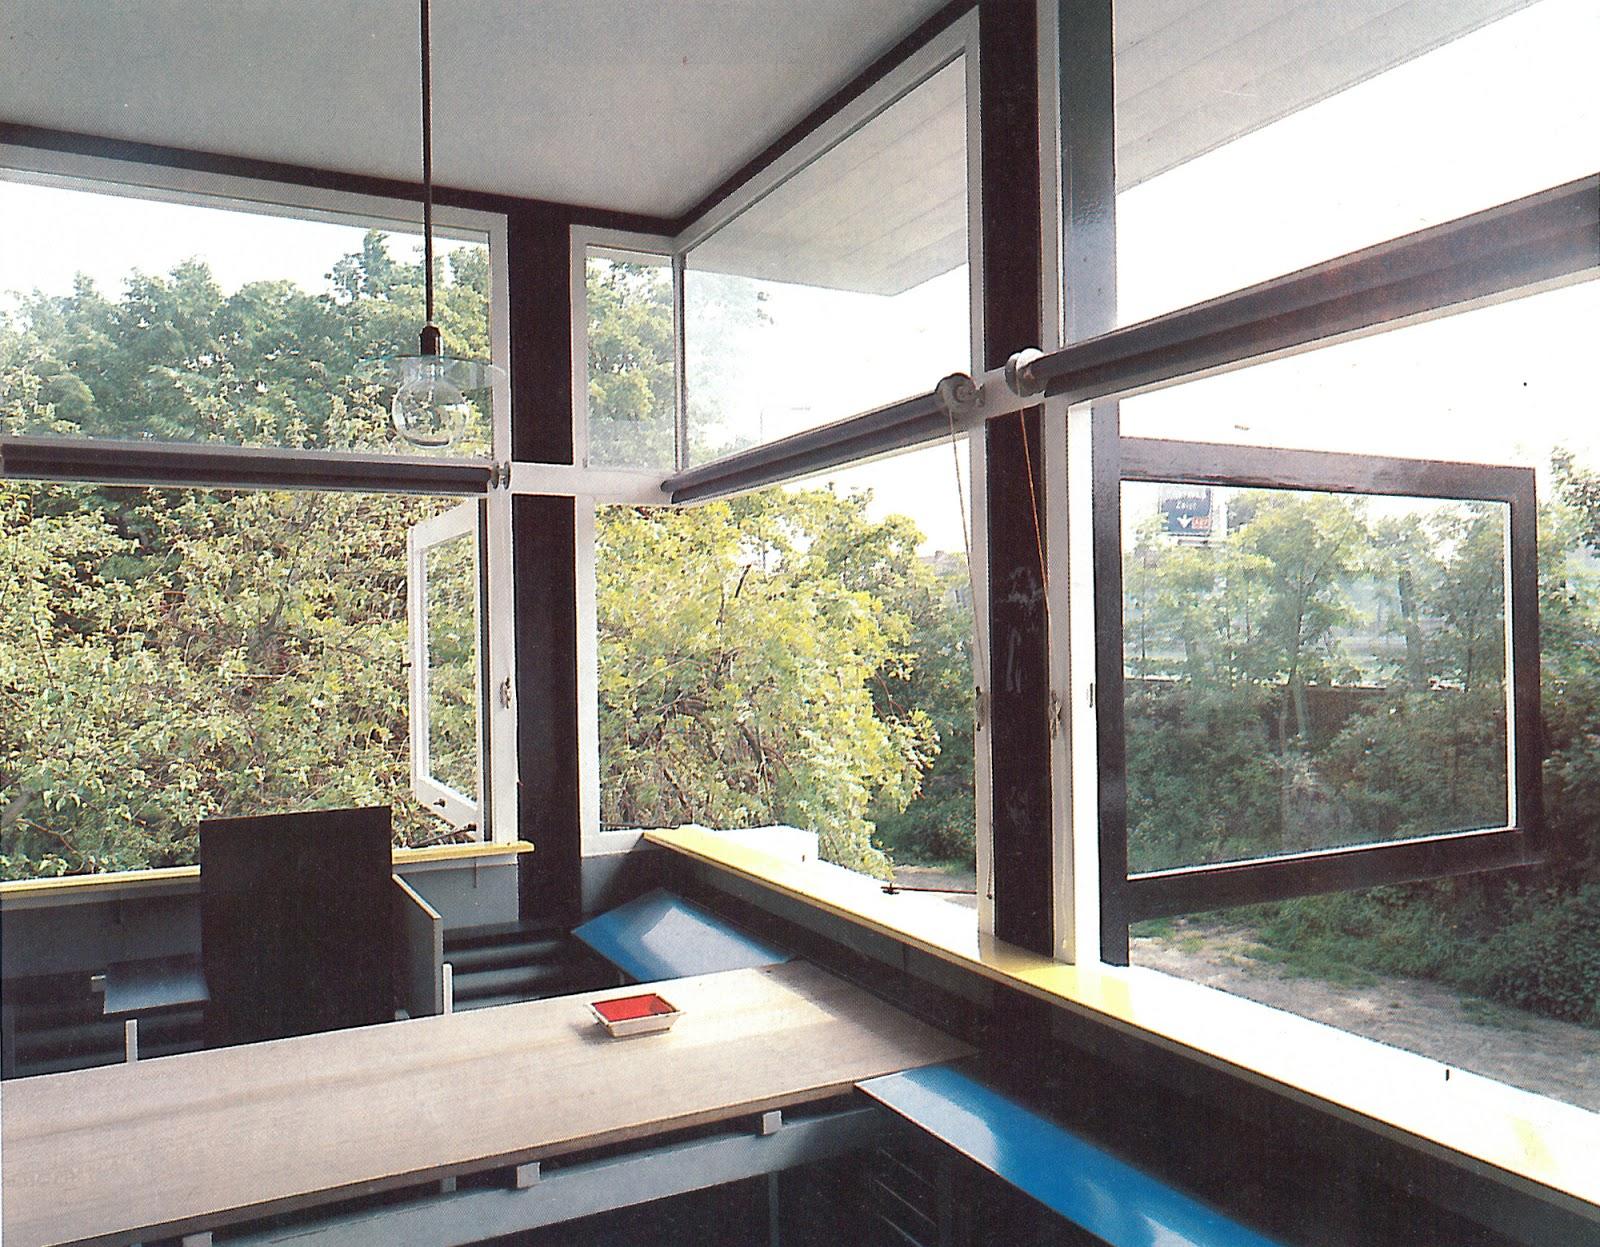 The Rietveld Schroder House Photographs